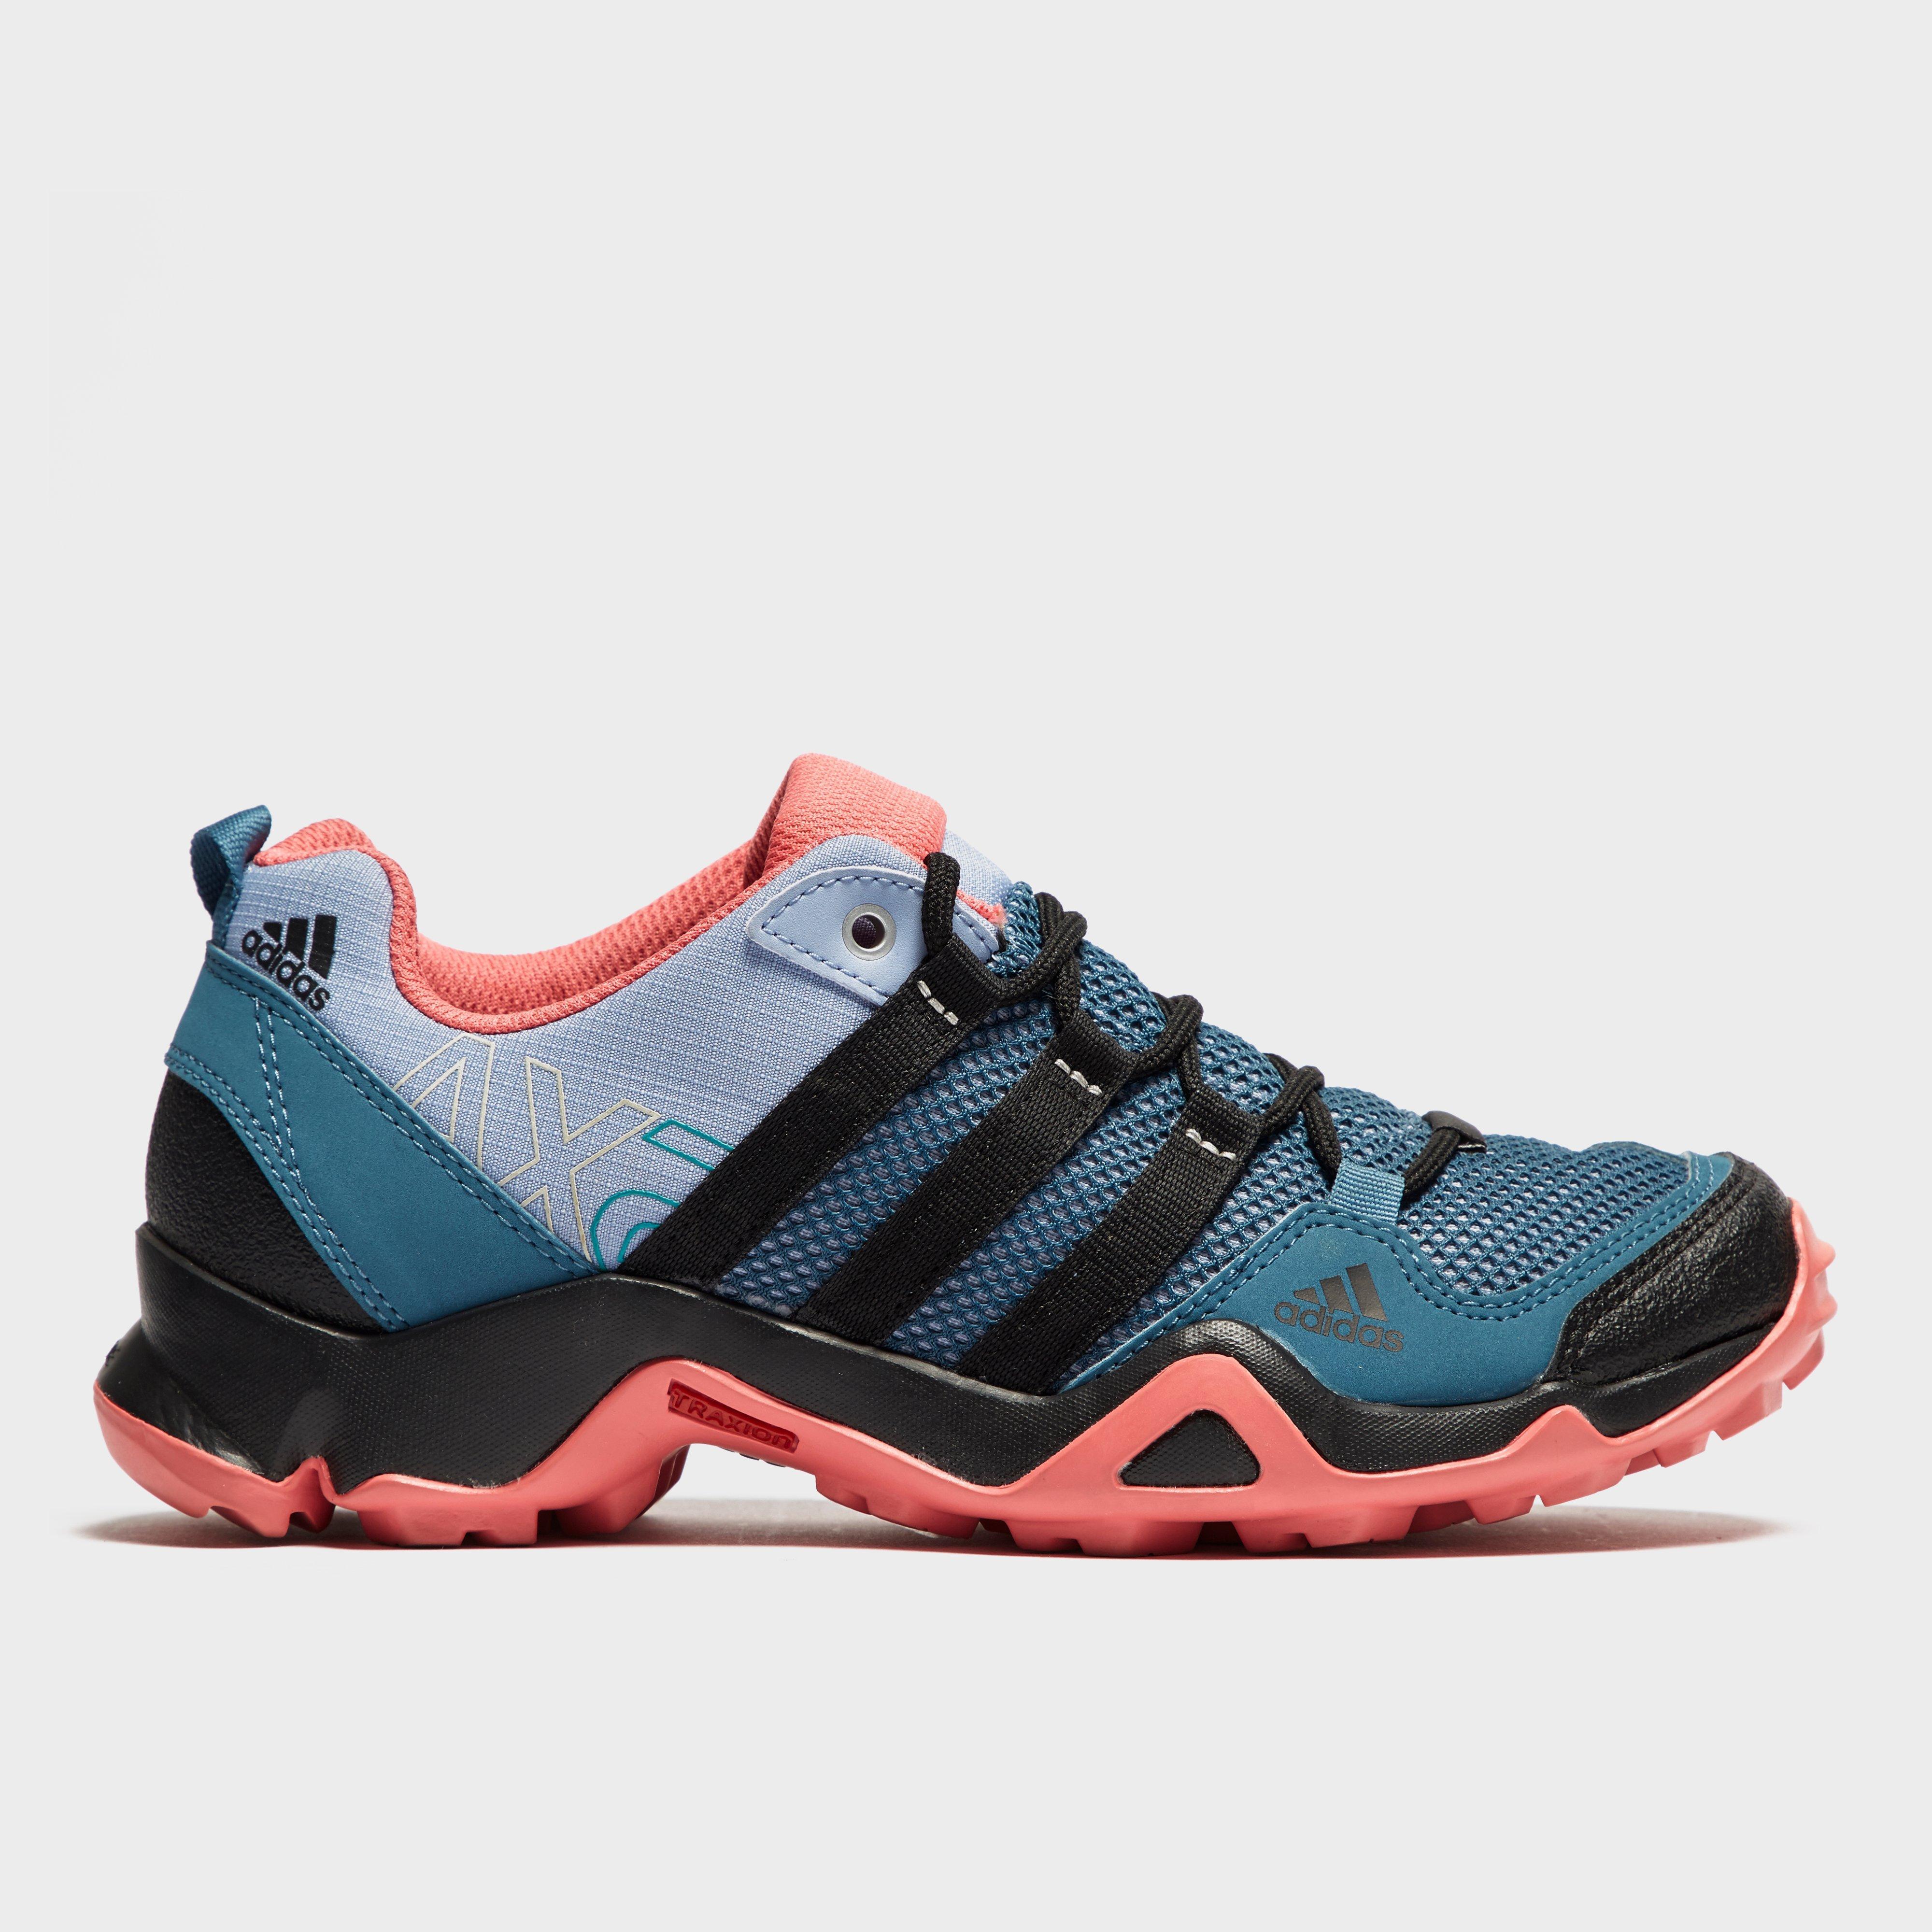 Adidas Womens AX2 Shoe PinkBlue